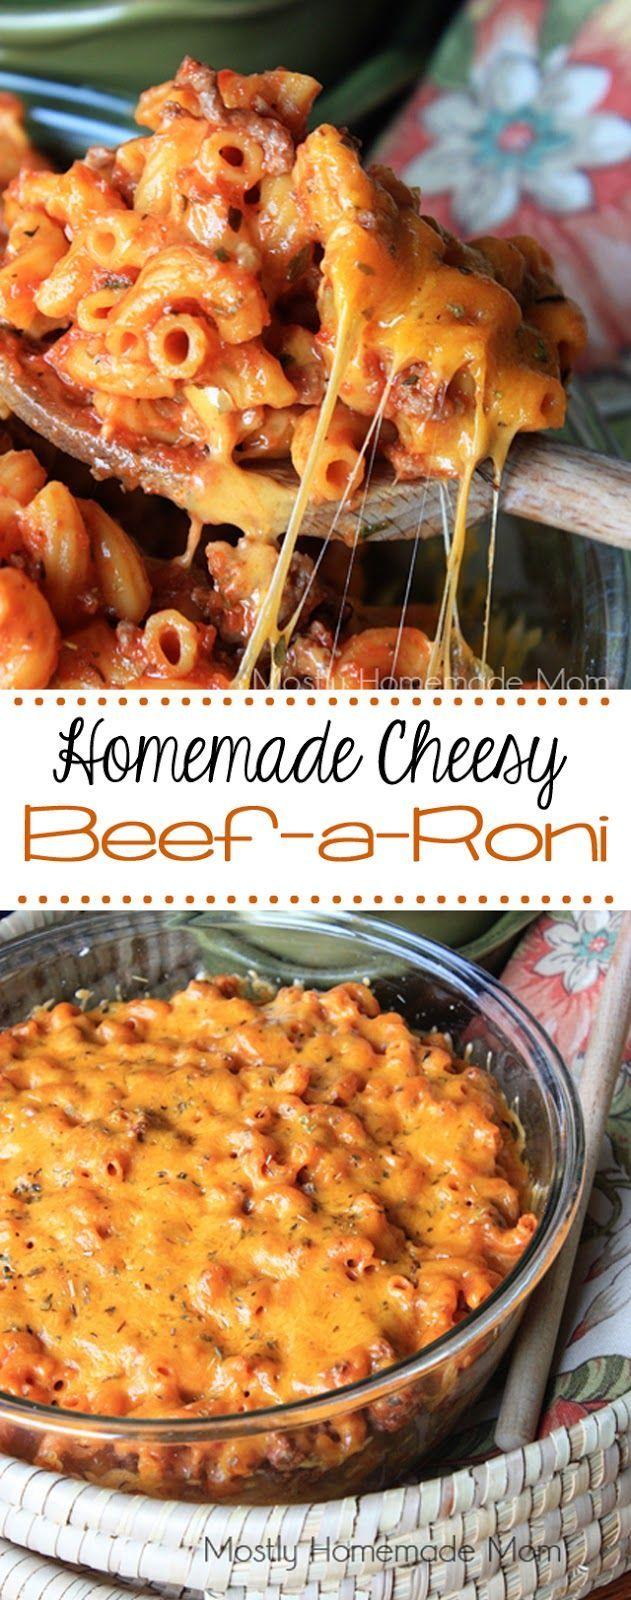 Homemade Cheesy Beef-a-roni with Barilla! #ShareTheTable